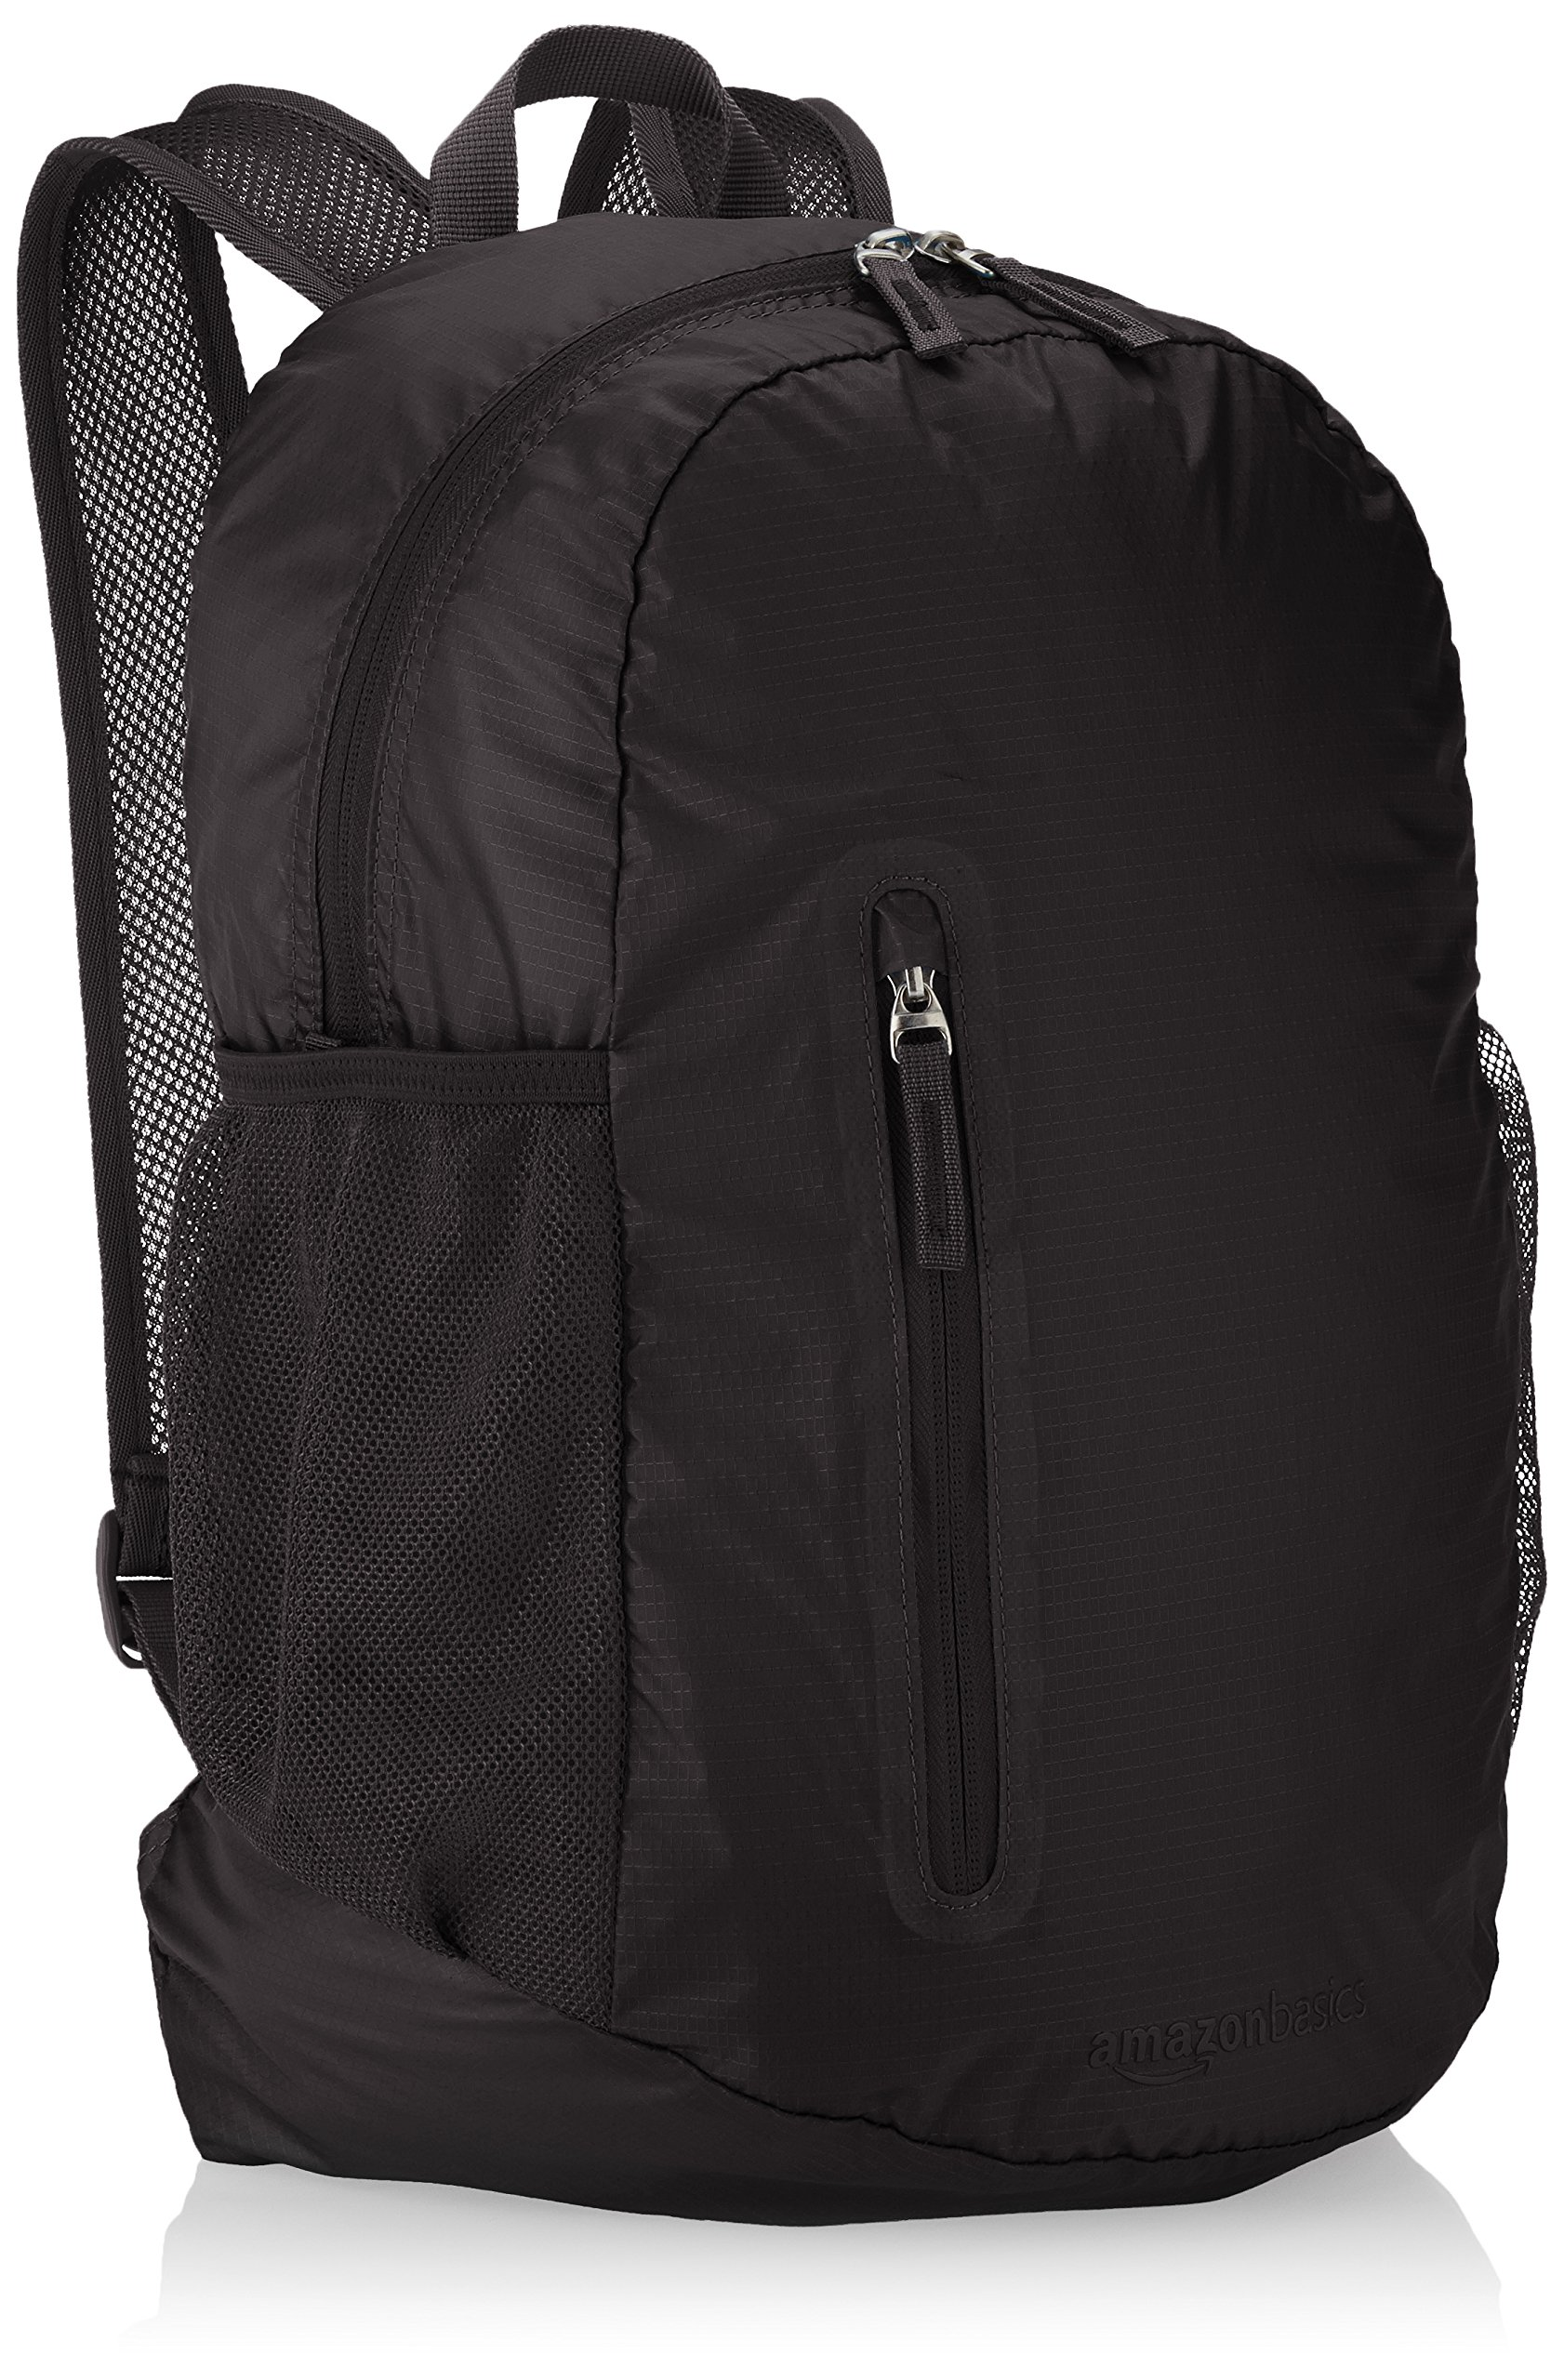 AmazonBasics Ultralight Packable Day Pack - Black, 25L